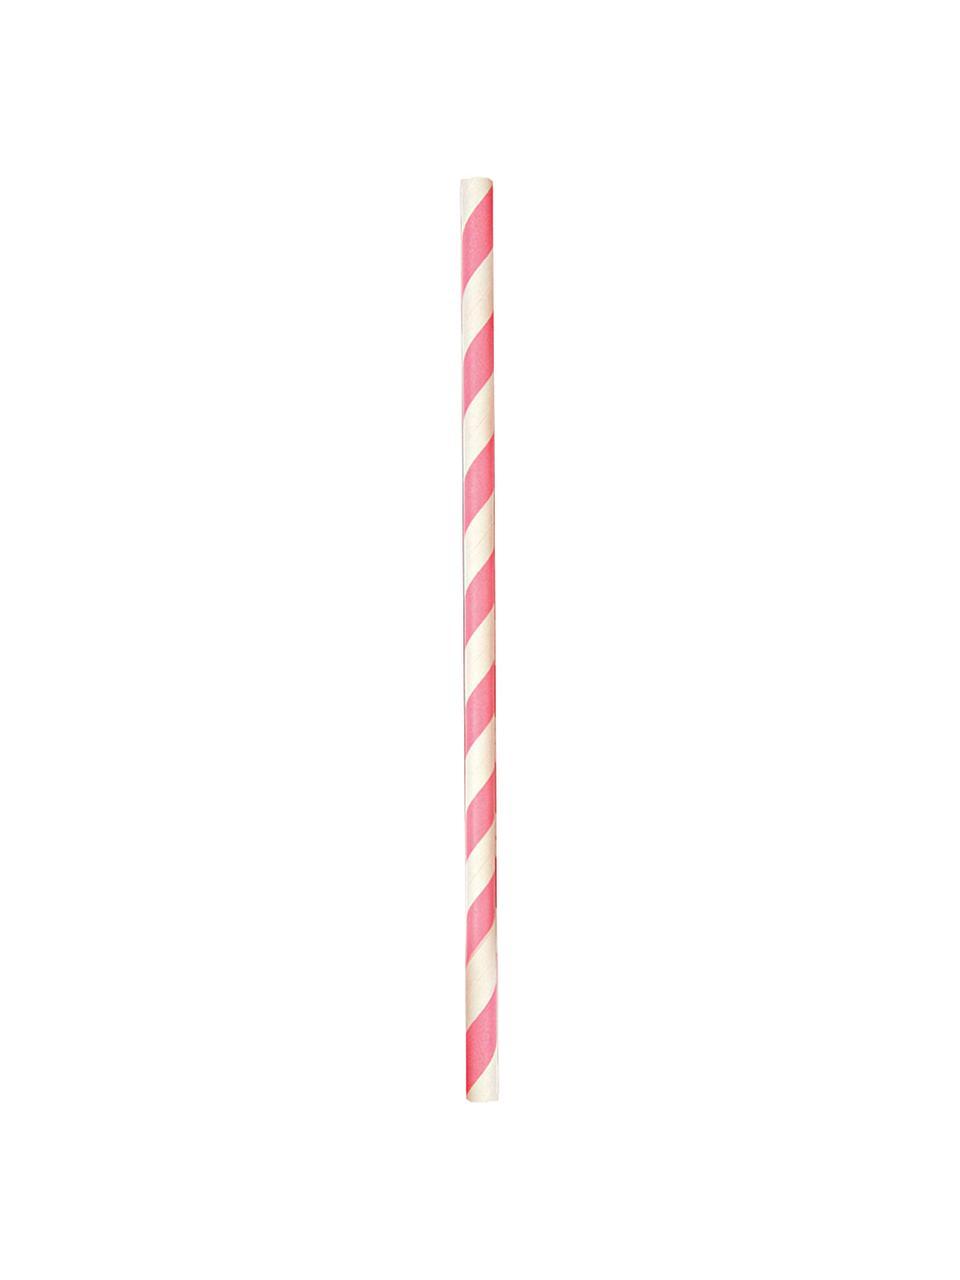 Strohhalme Agni, 24 Stück, Papier, Weiß, Pink, Ø 1 x H 20 cm